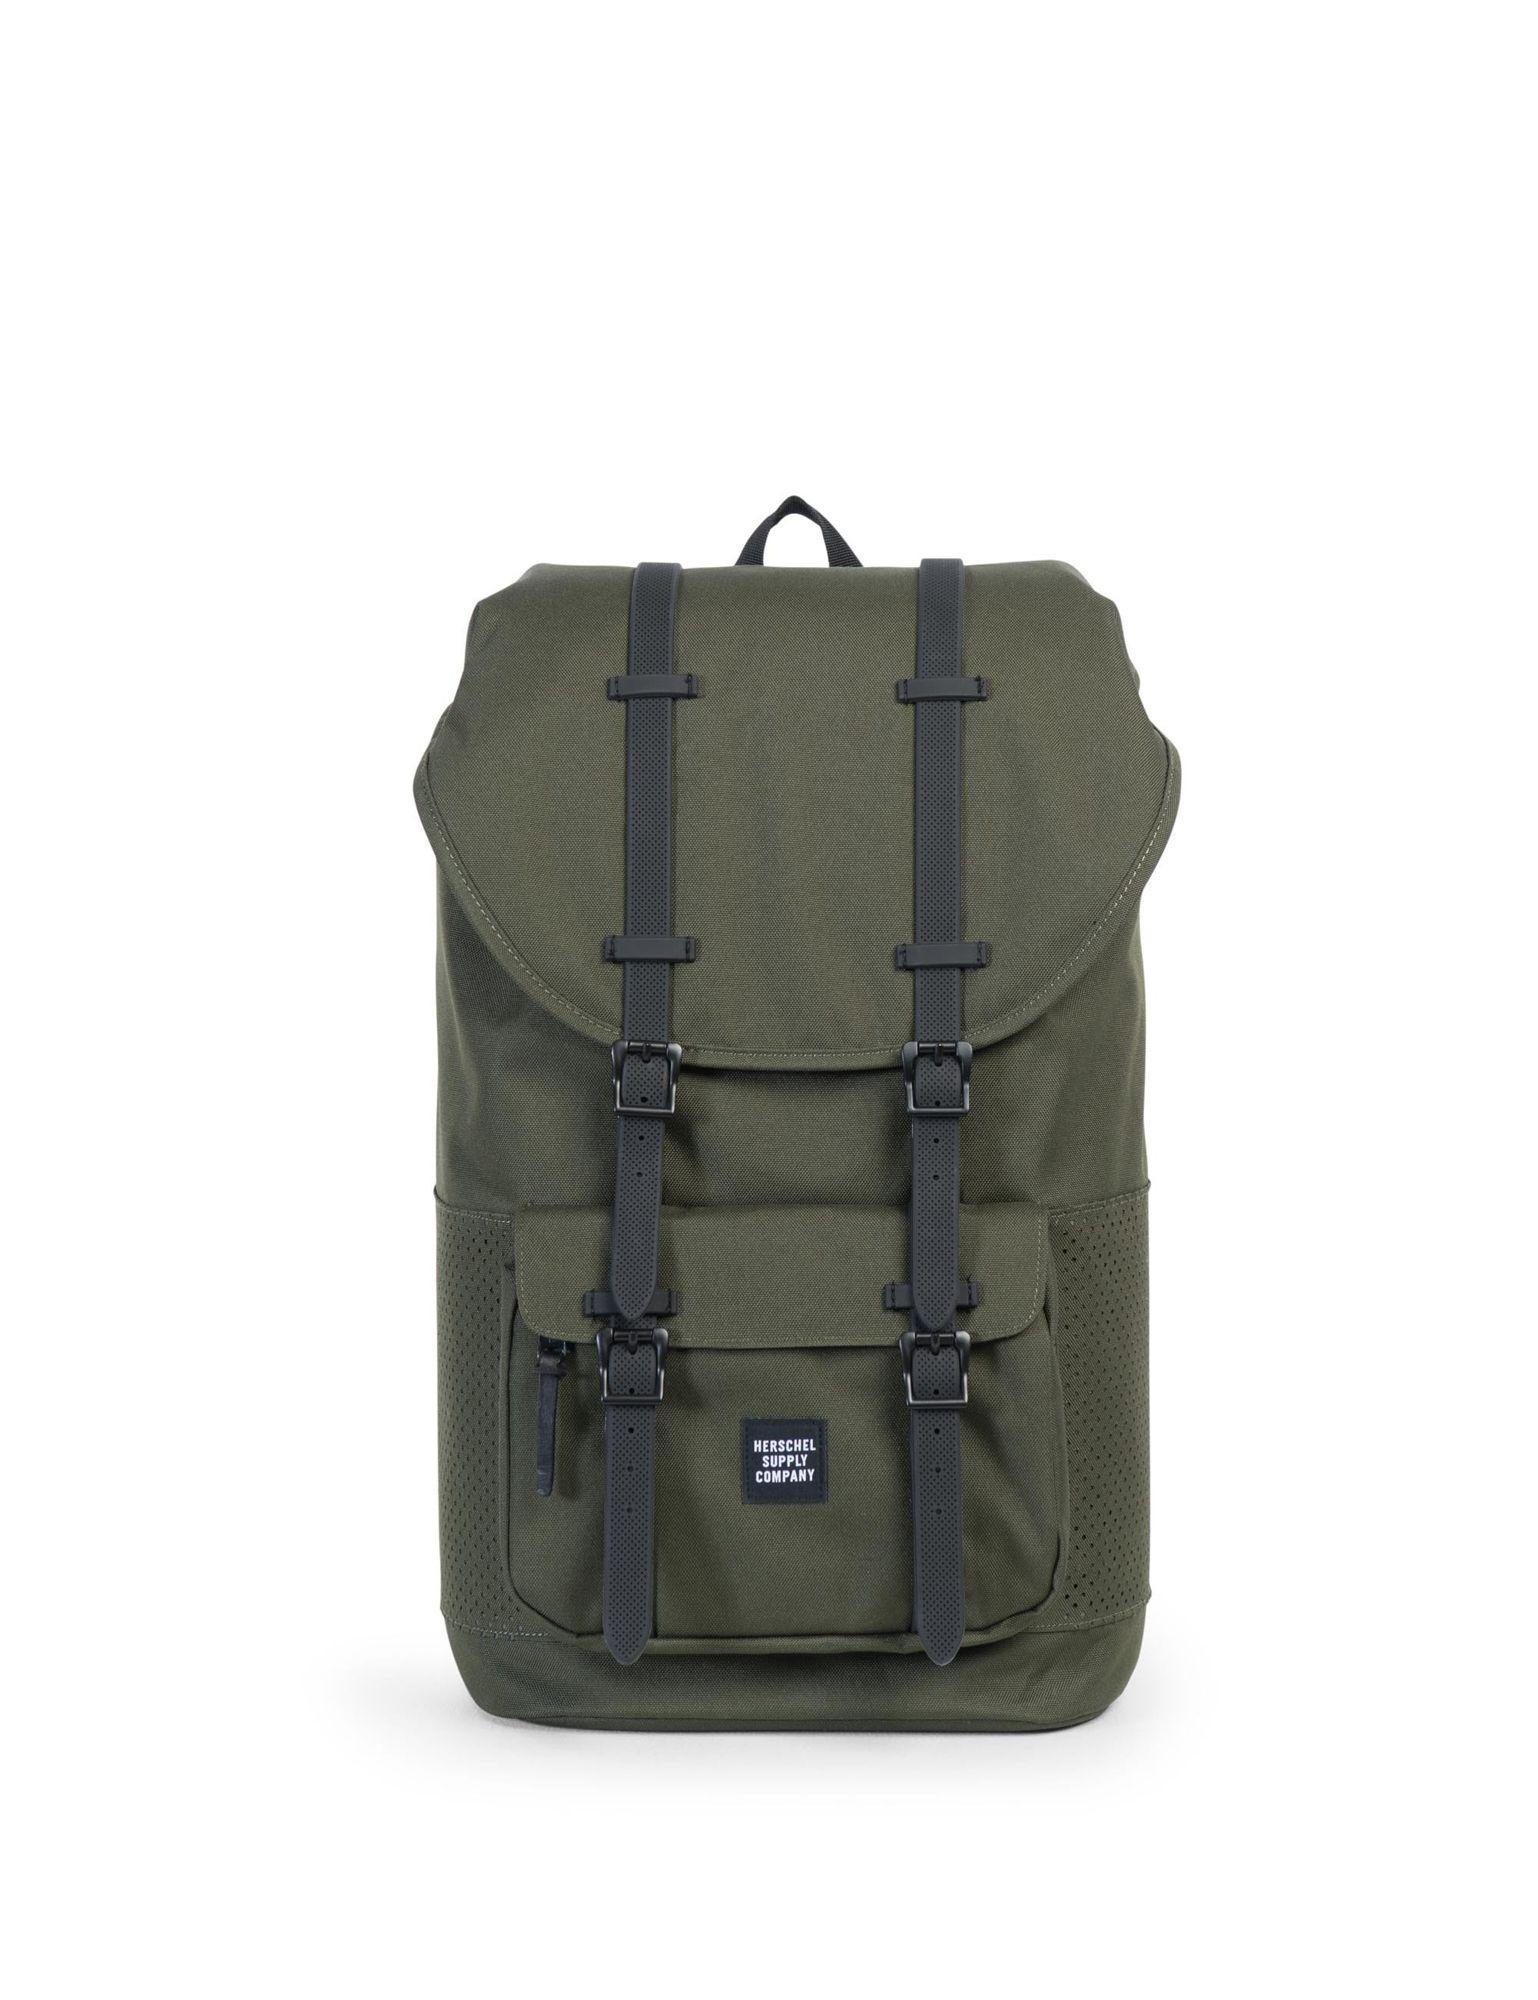 Little America Unisex Prasino Sakidio Herschel Backpack Herschel Supply Co Backpacks